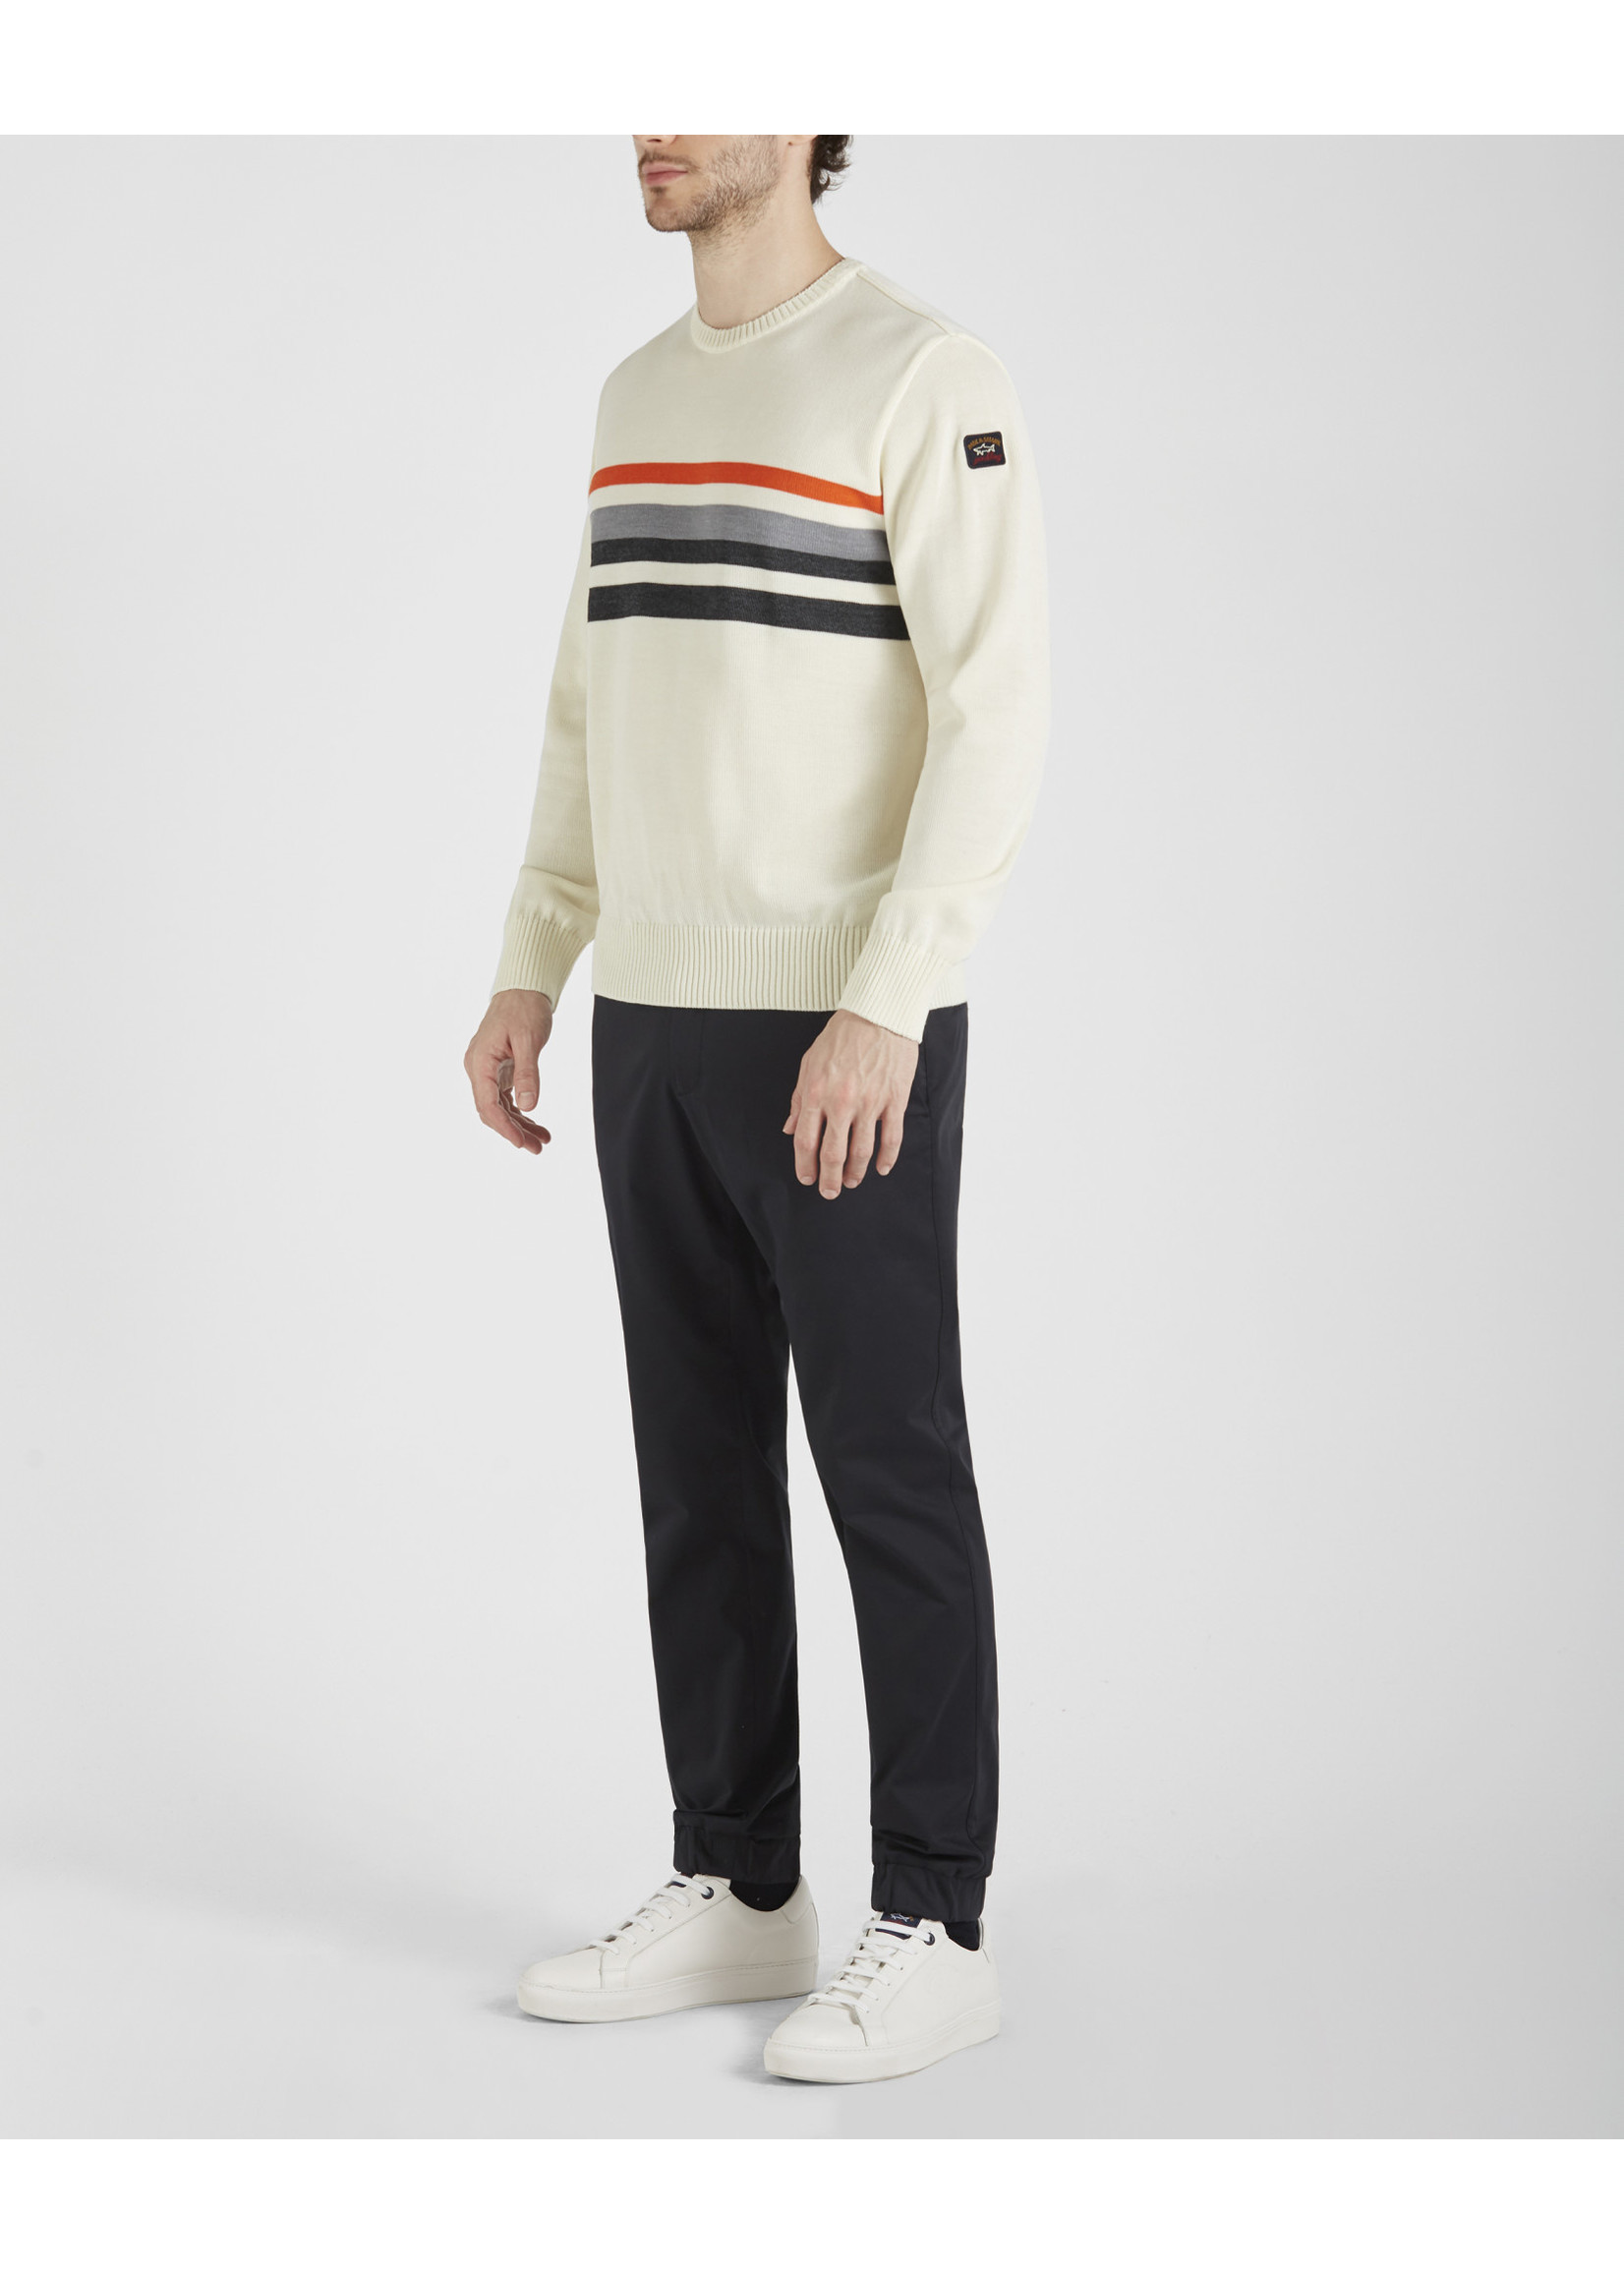 Paul & Shark pullover ecru driekleurige strepen